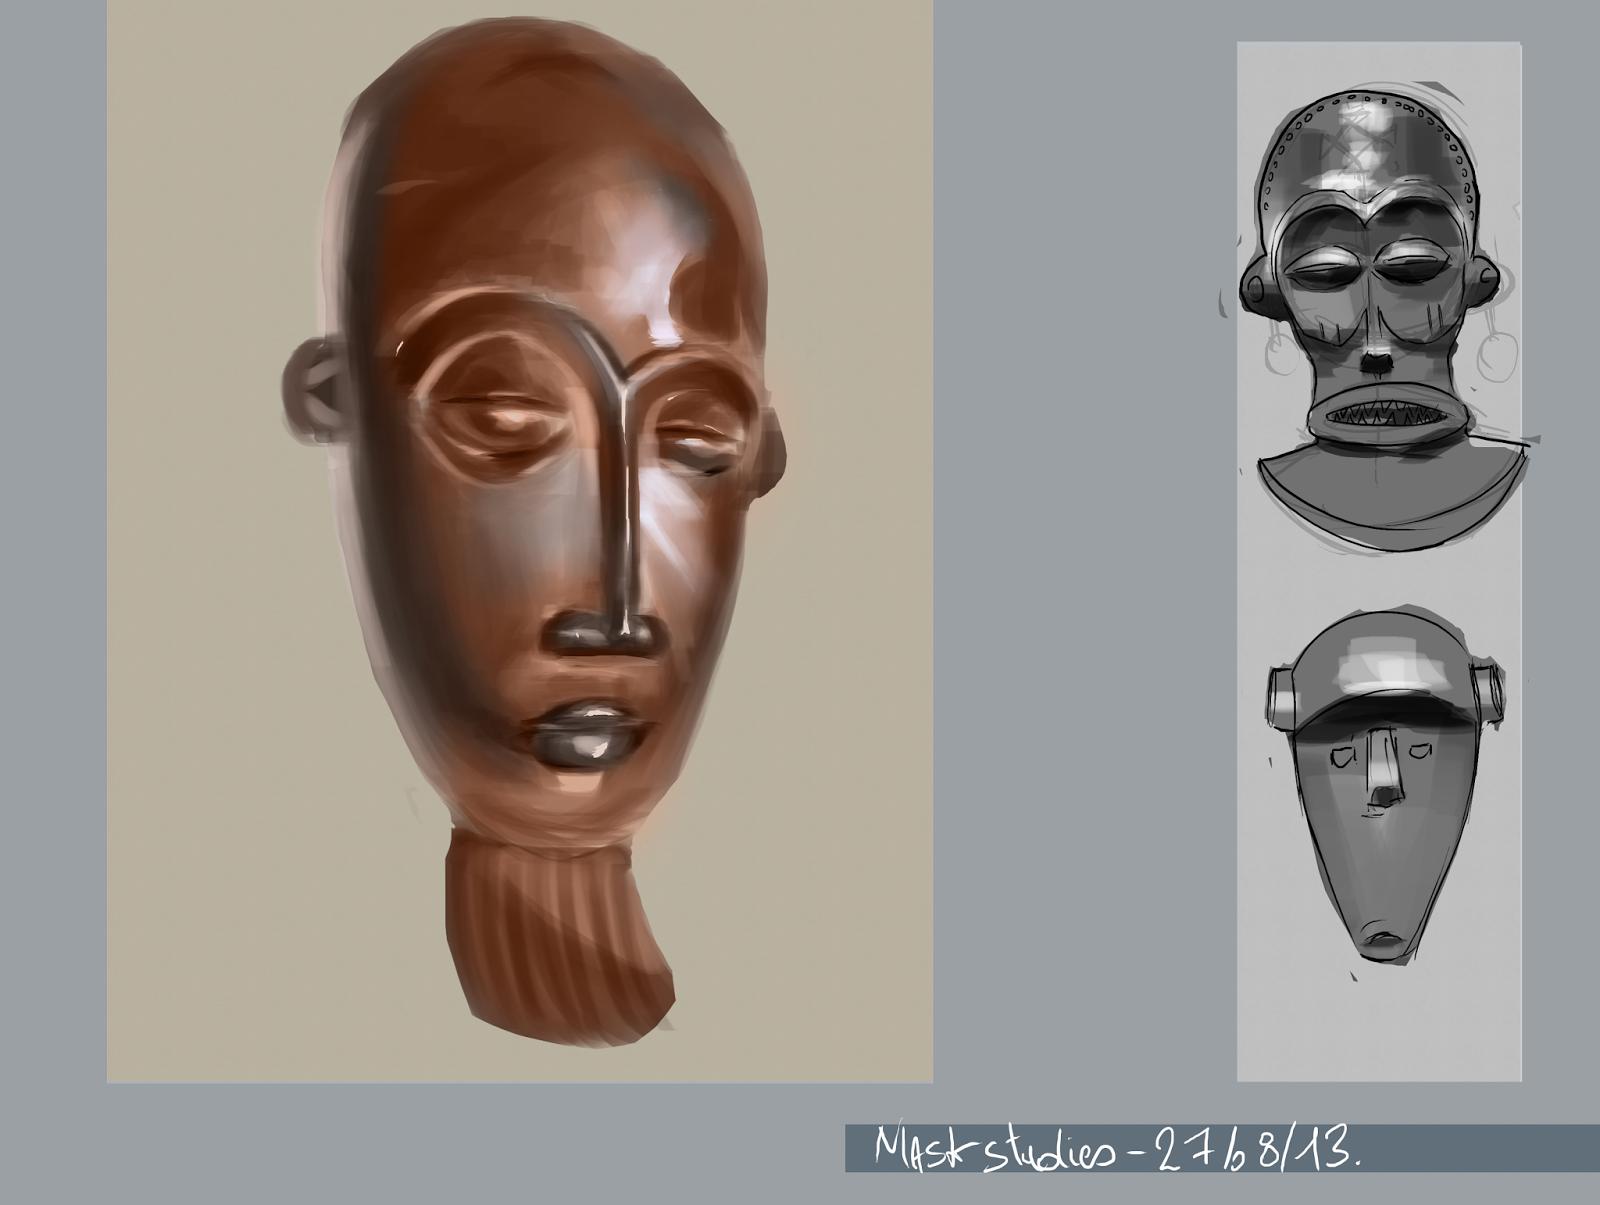 Gallerie de Dream - - Page 2 Study_masque